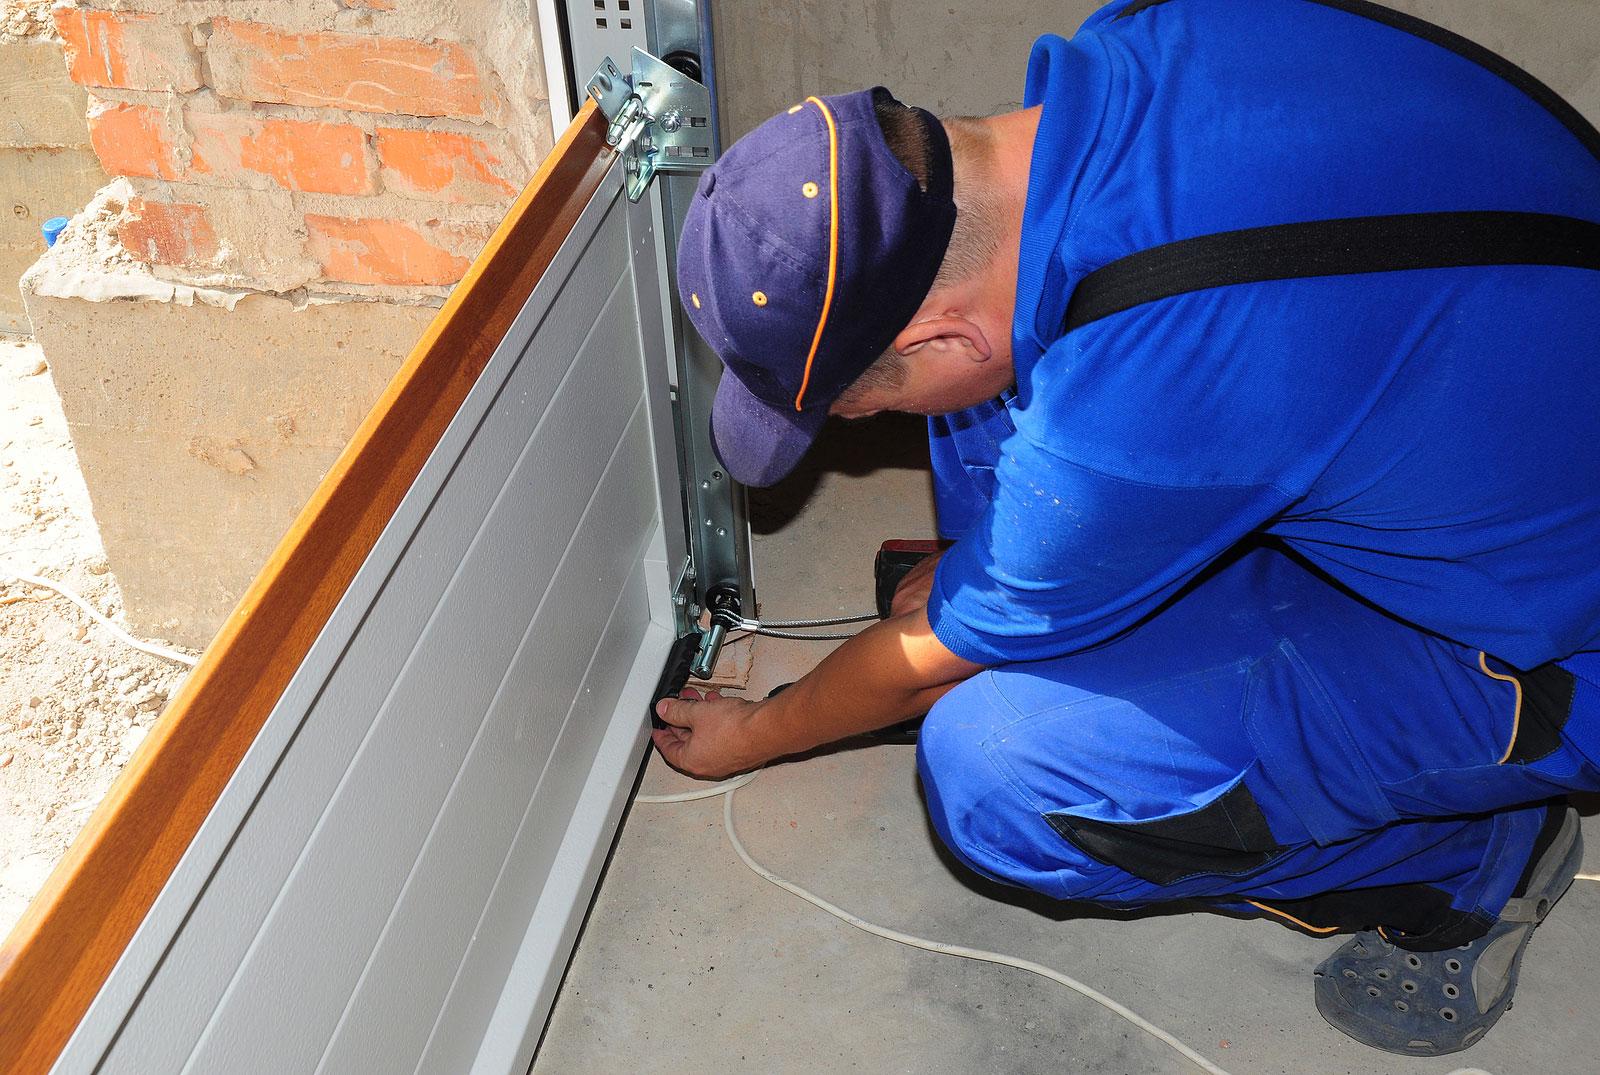 Benefits of automated garage door in your home